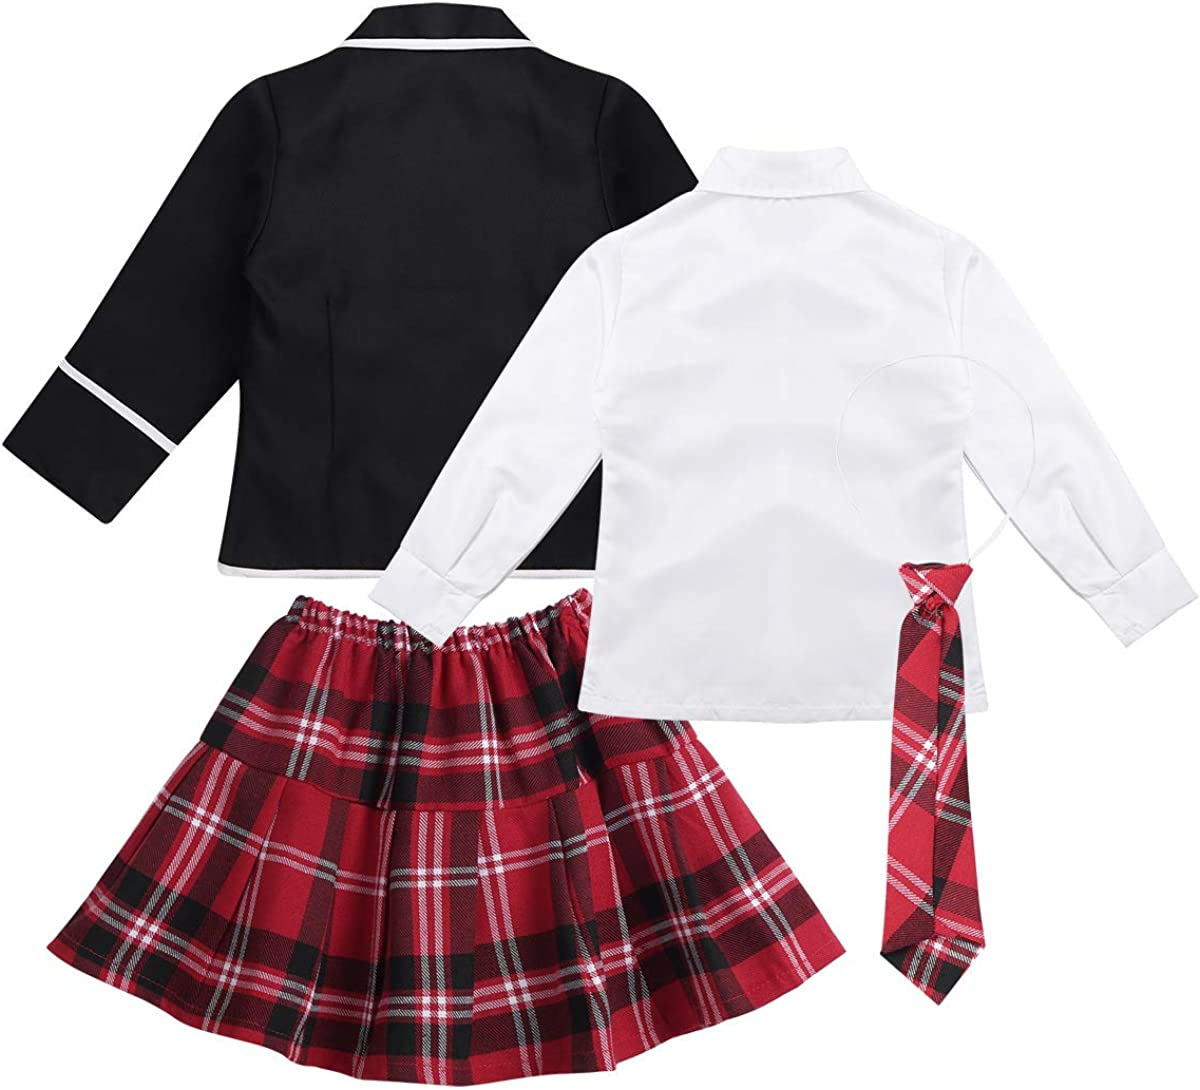 ACSUSS Kids Girls Korea British Japan School Uniforms Outfits Japanese School Girls Anime Costume Dress Clothes Set